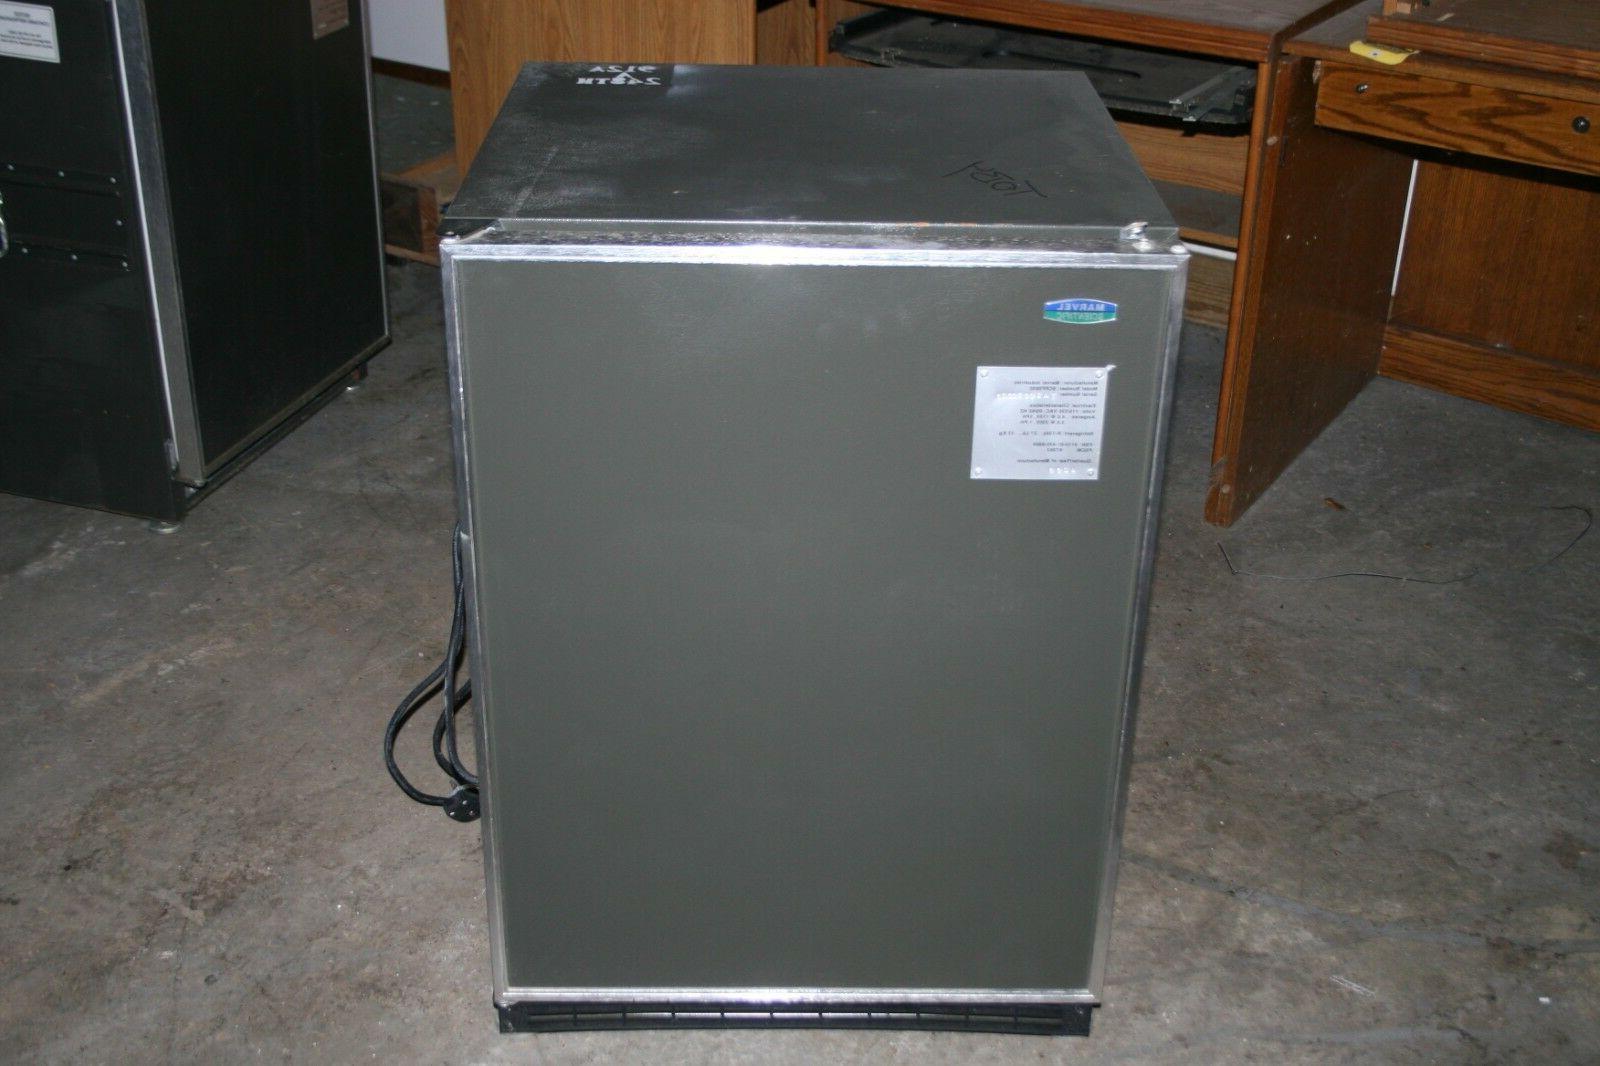 lab freezer refrigerator 6crf0600 115 230 volt